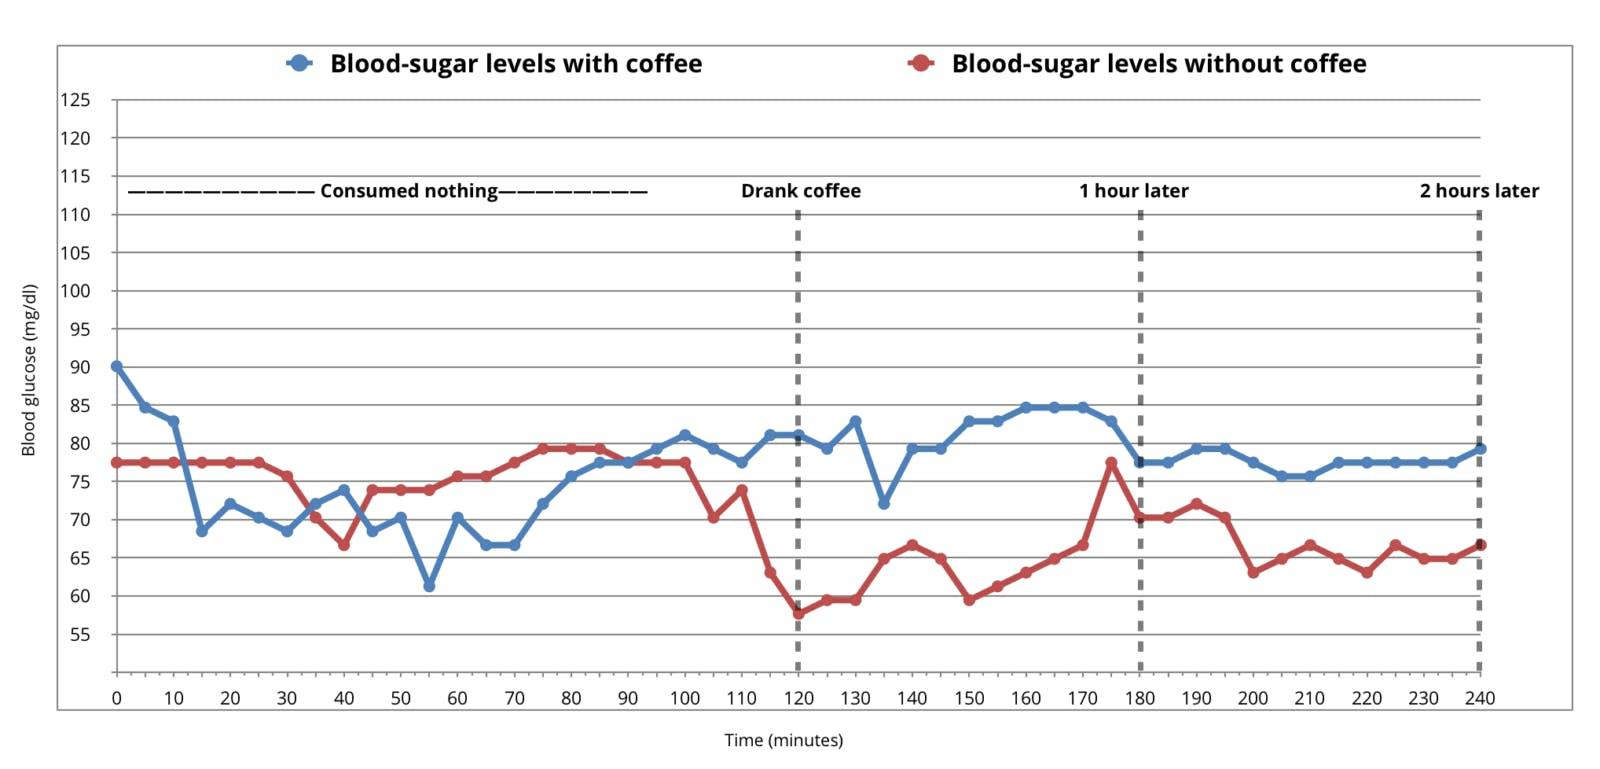 Höjer <strong>kaffe</strong> blodsockret? Preliminära resultat